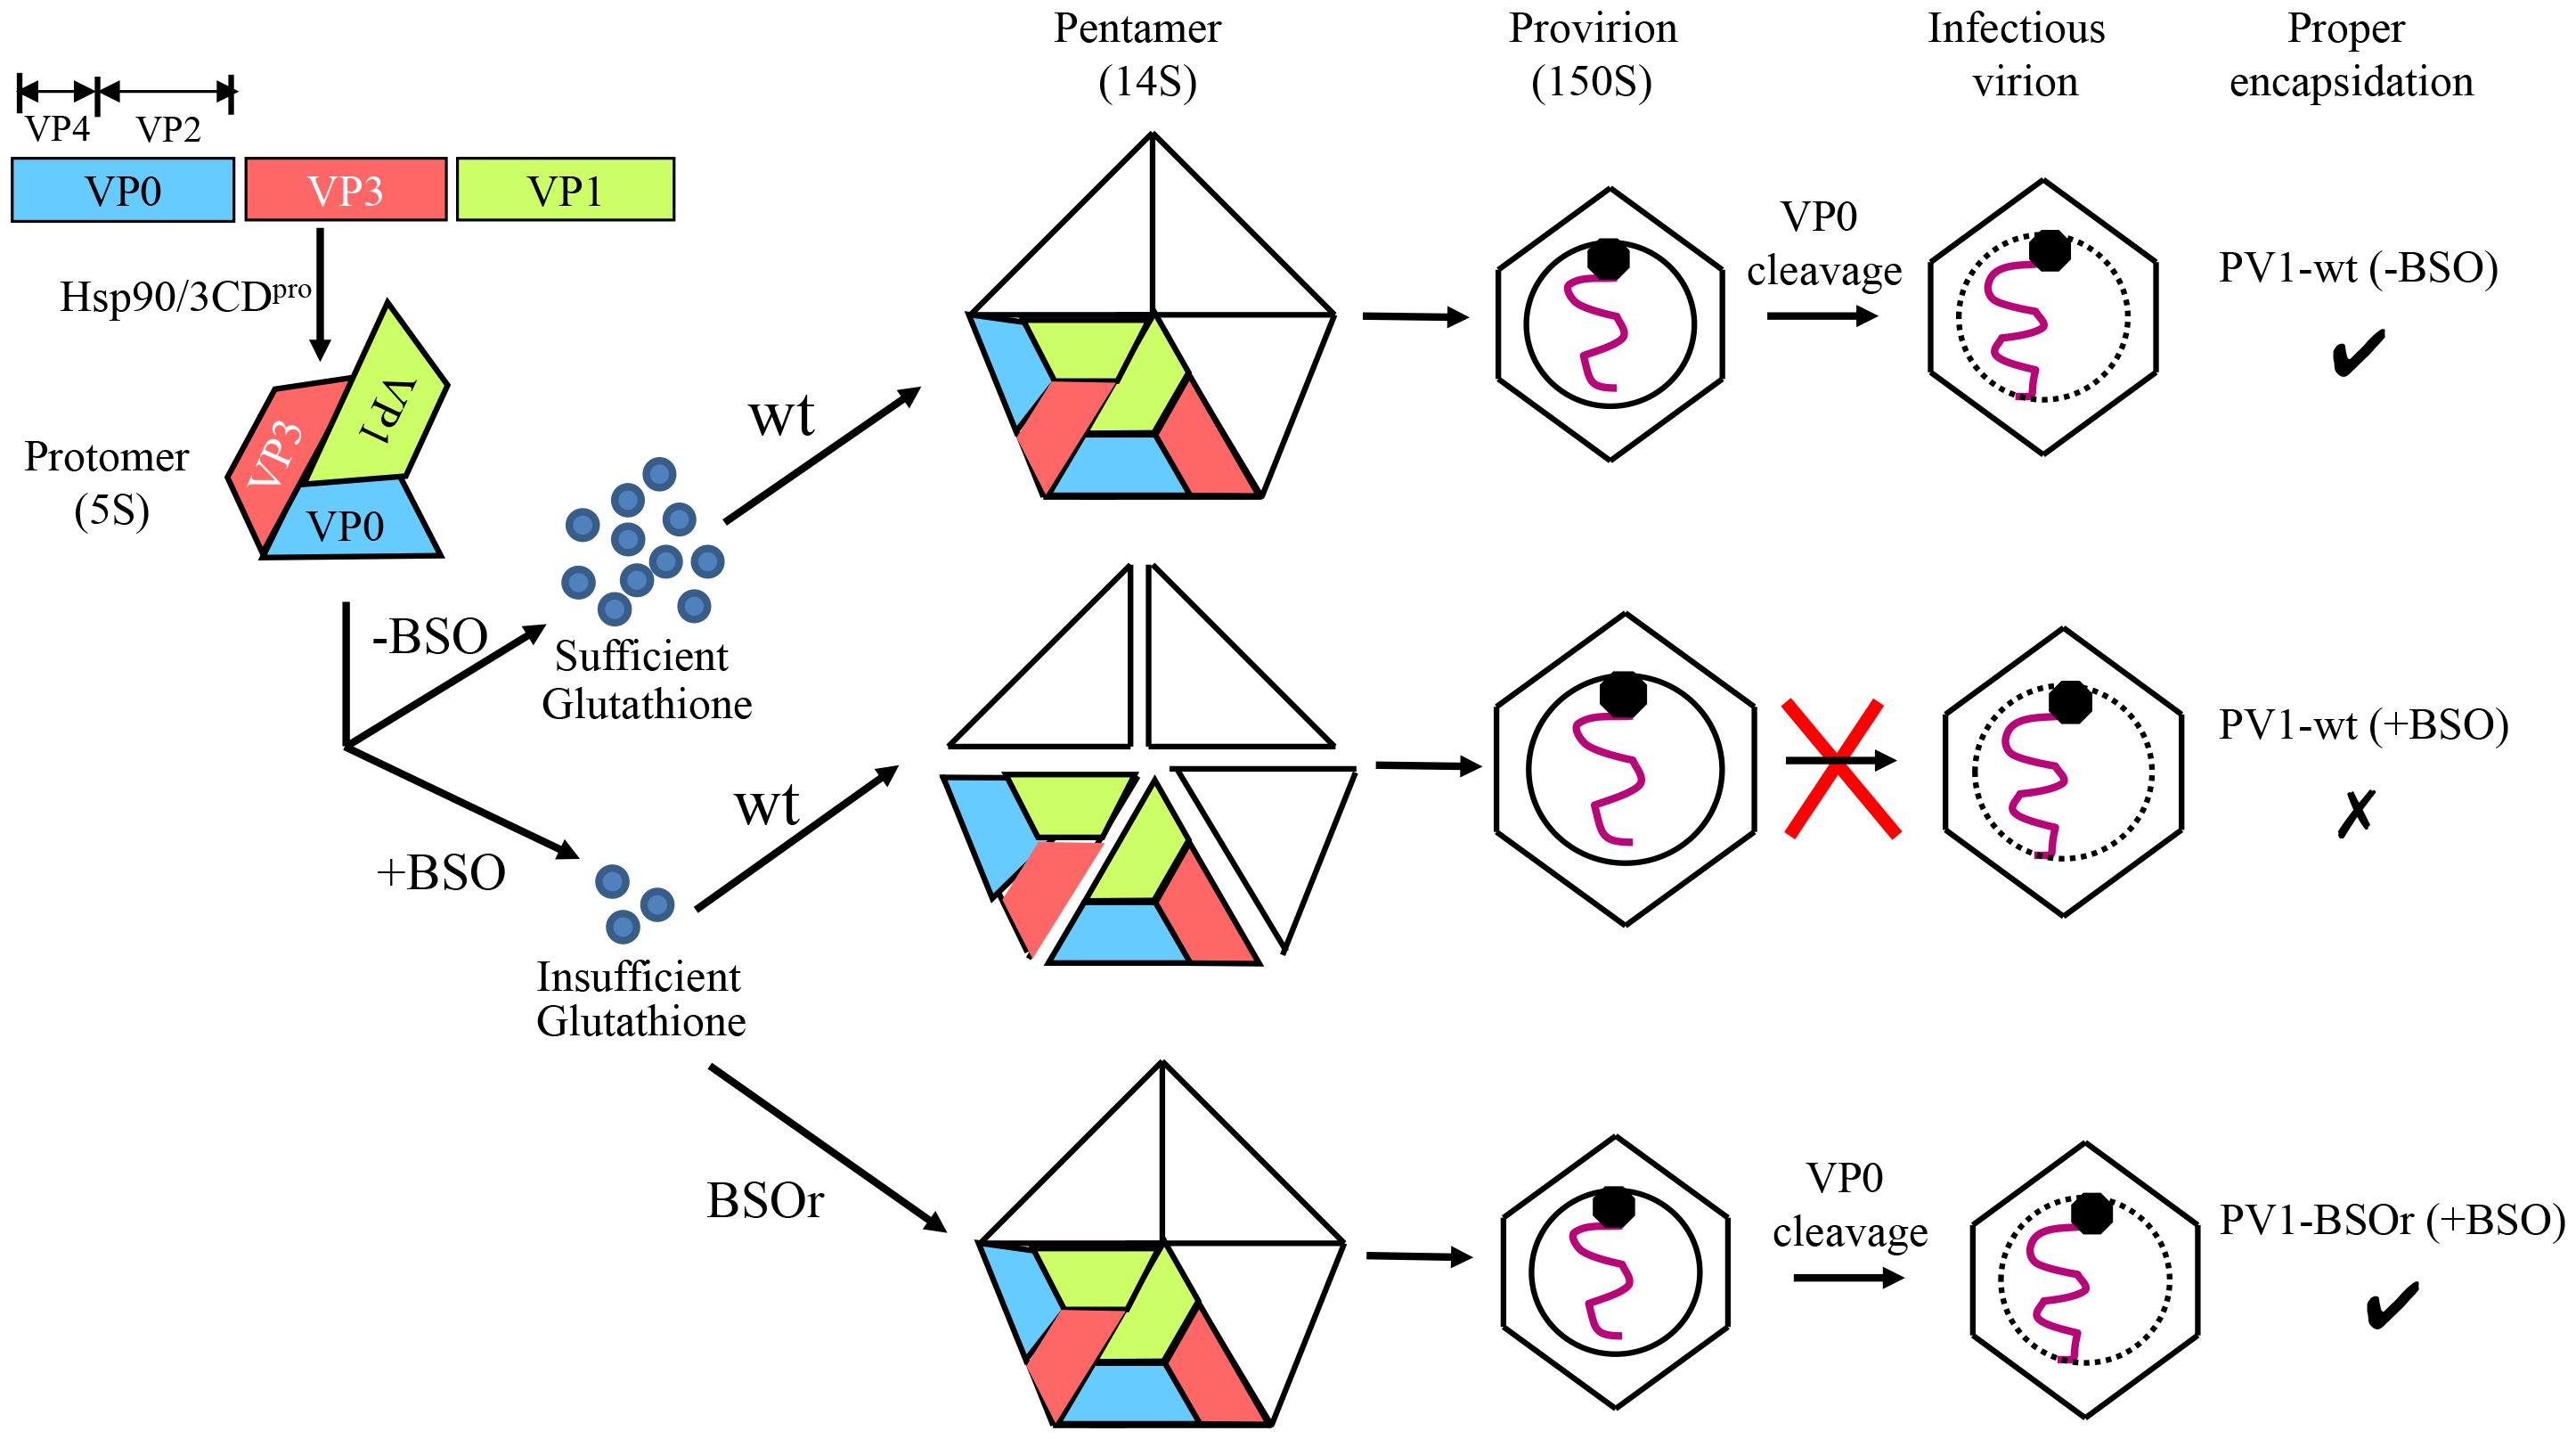 Model for the role of GSH in the morphogenesis of C-cluster enteroviruses.